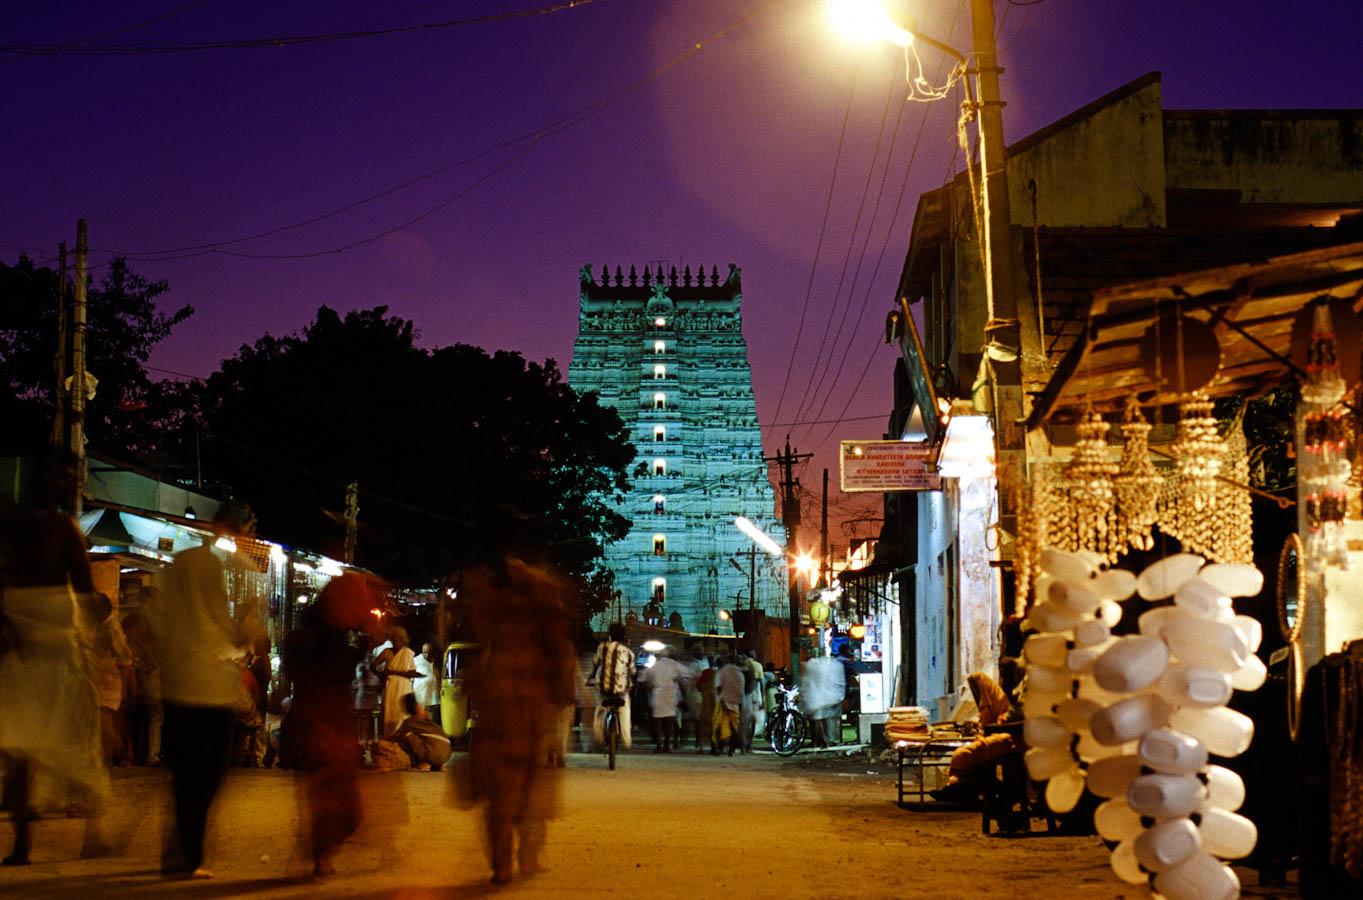 travel-photography-india-8-jpg